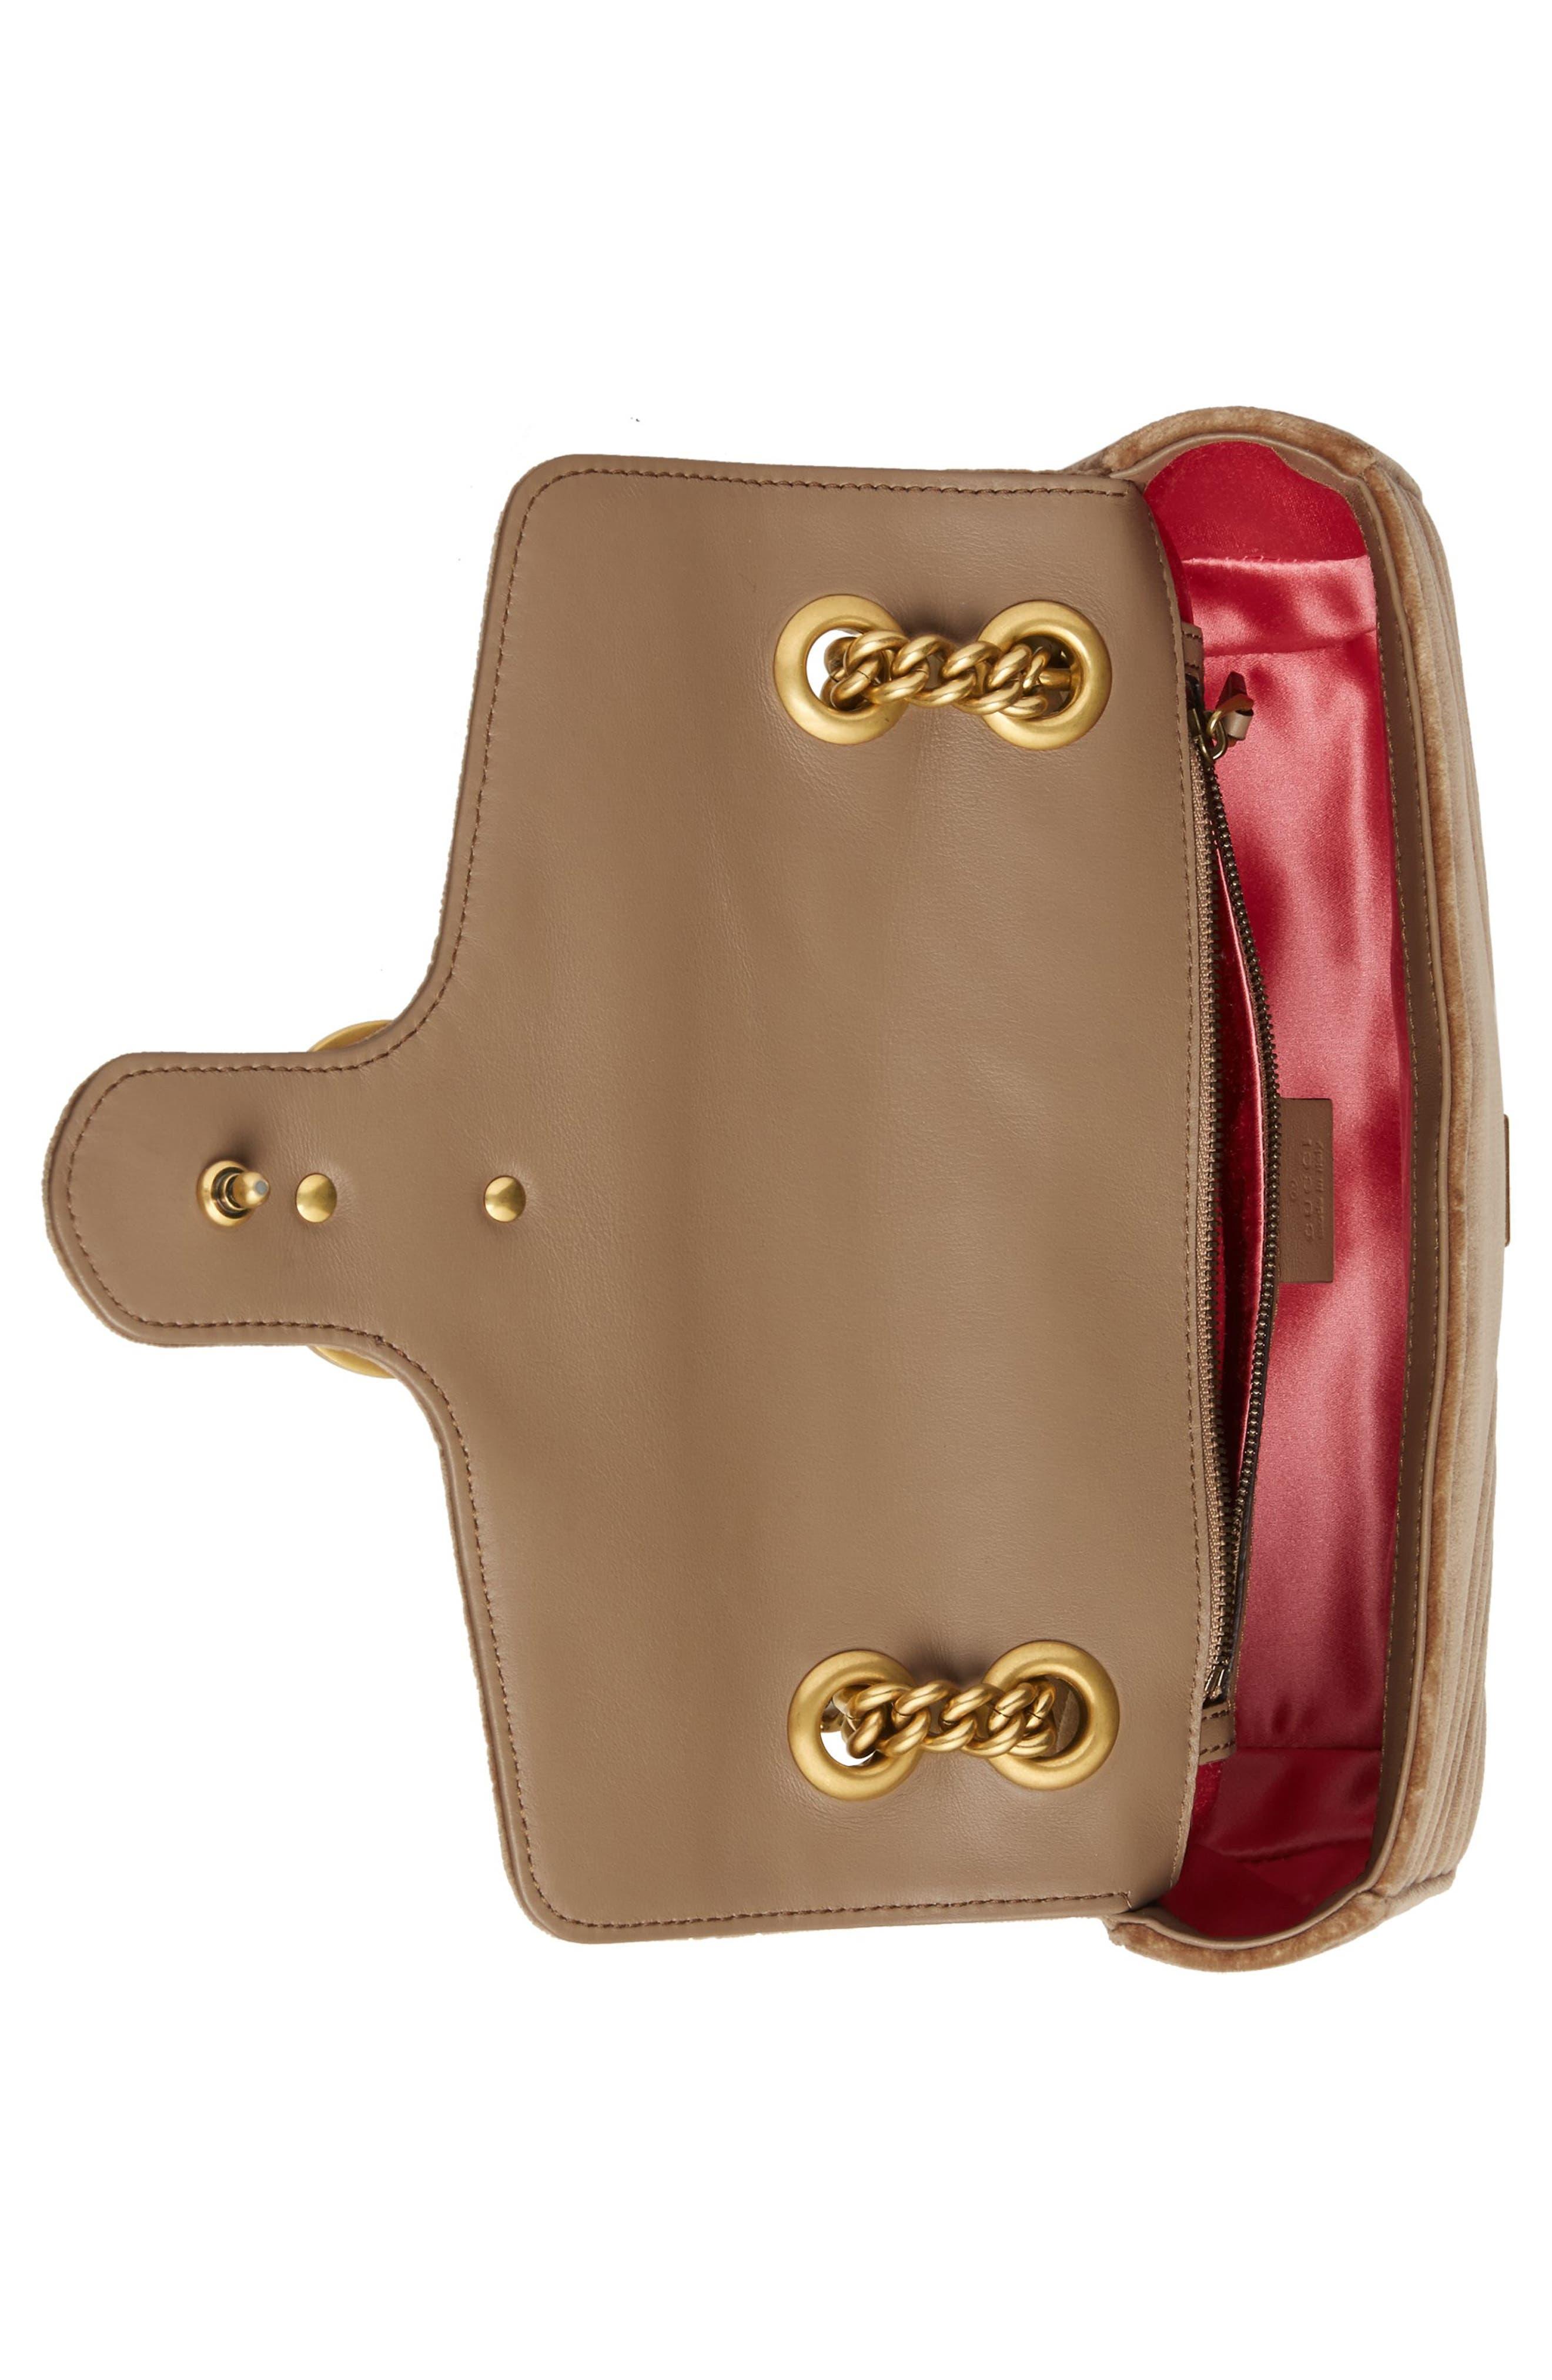 Medium GG Marmont 2.0 Matelassé Velvet Shoulder Bag,                             Alternate thumbnail 3, color,                             TAUPE/ TAUPE